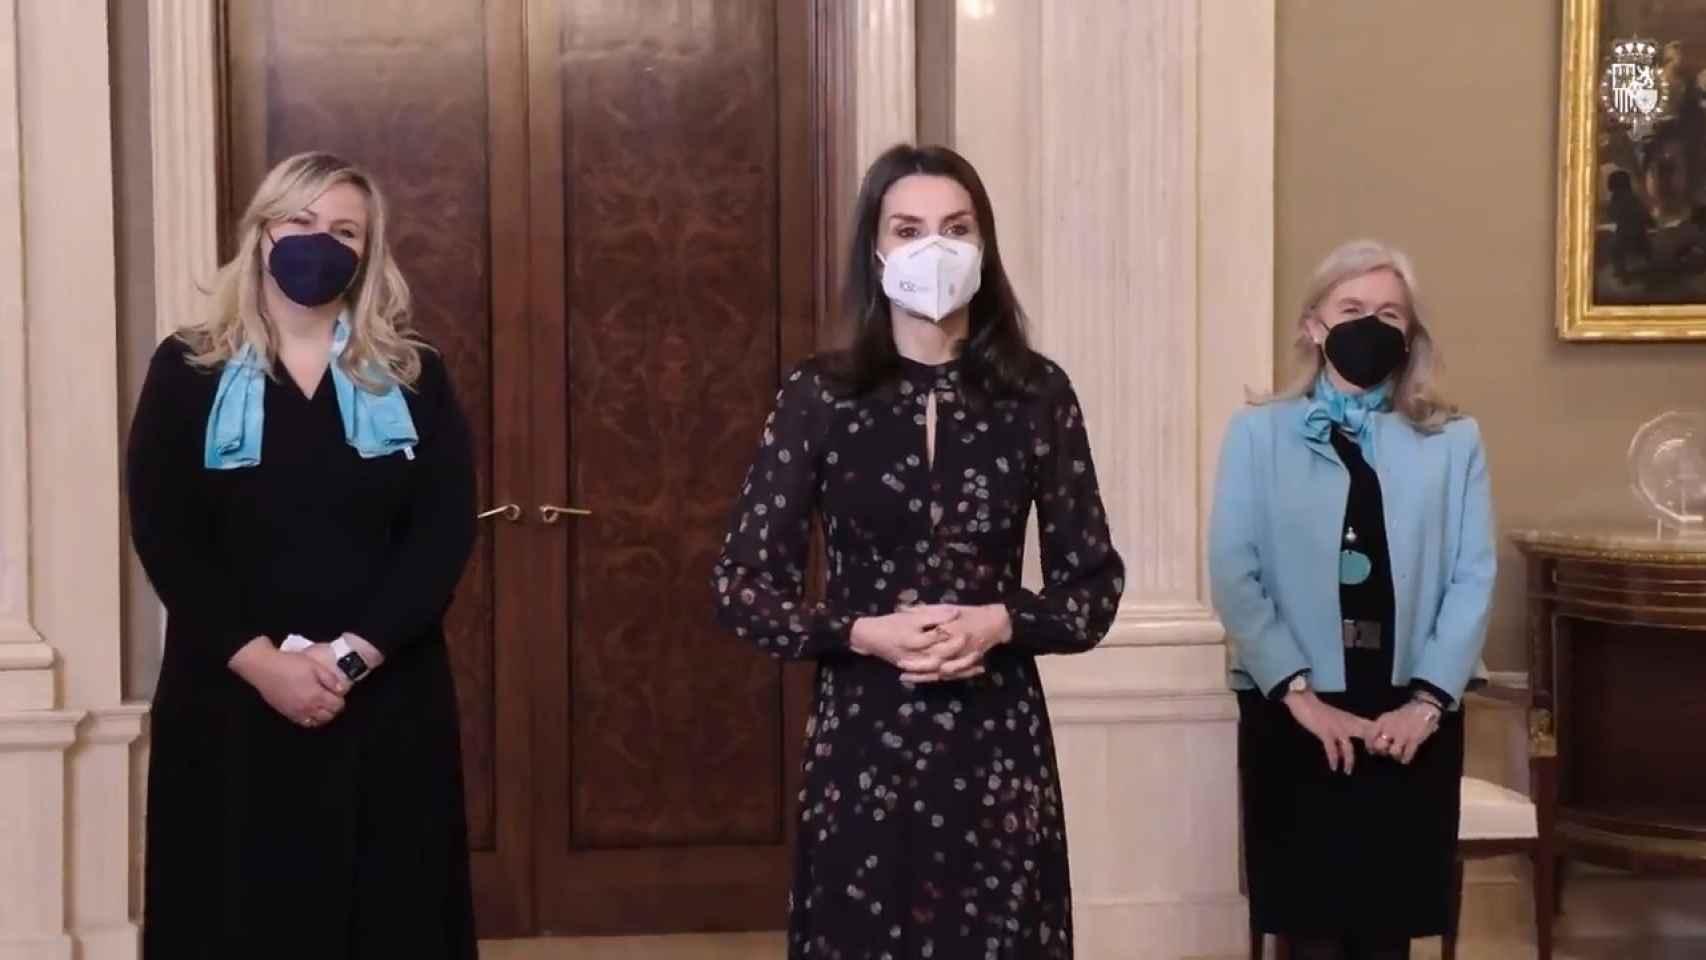 La Reina Letizia recupera su aplaudido vestido 'confeti'